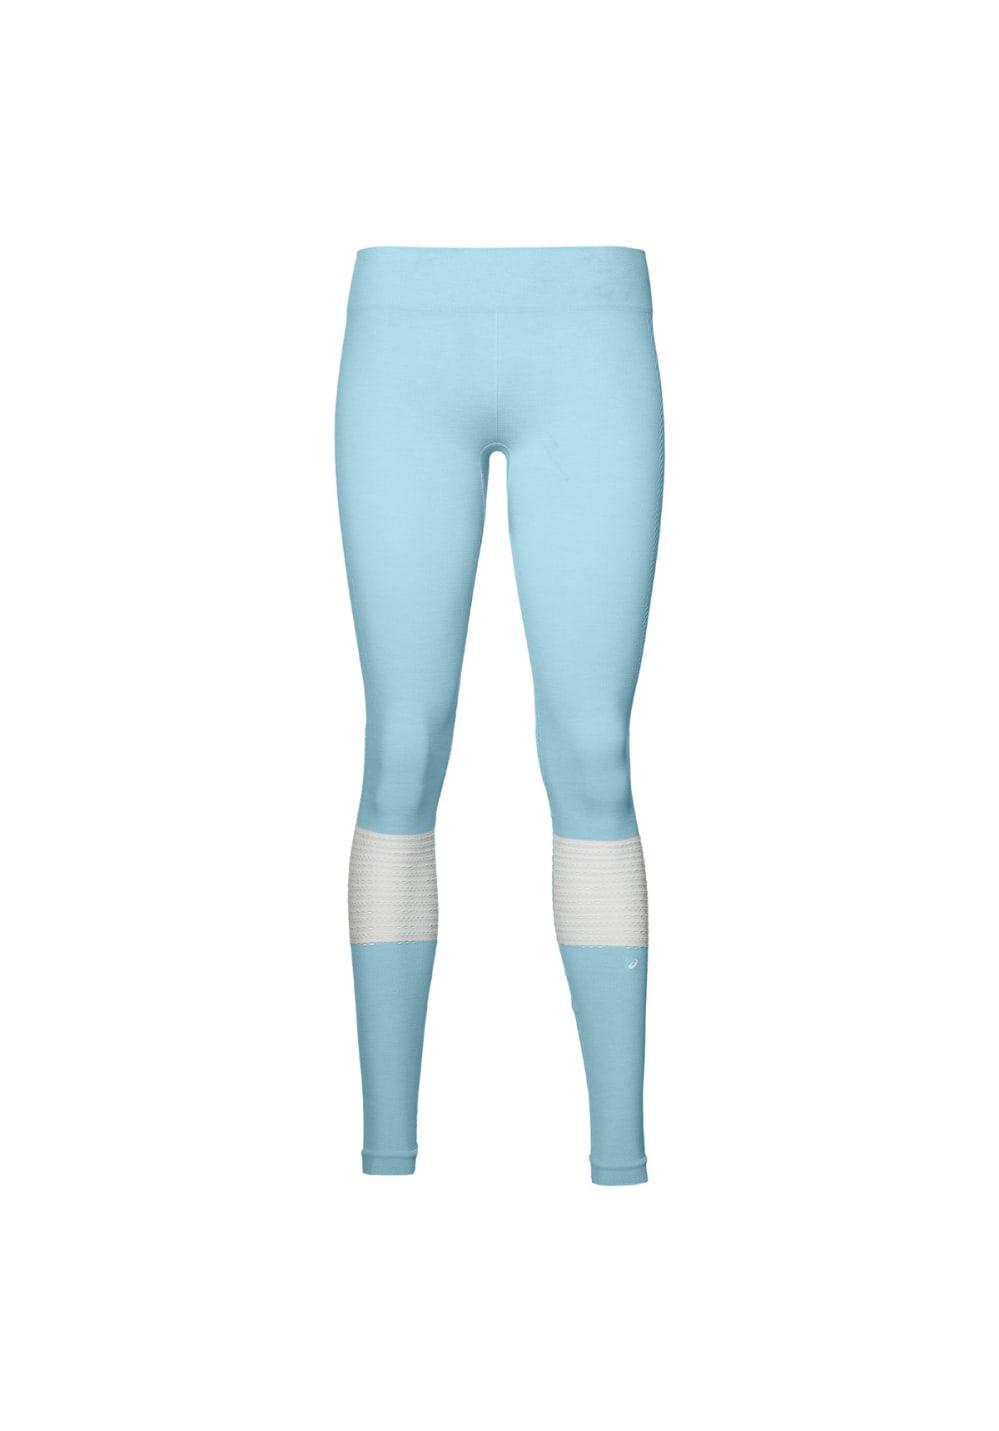 ASICS Seamless Tight - Laufhosen für Damen - Blau, Gr. L